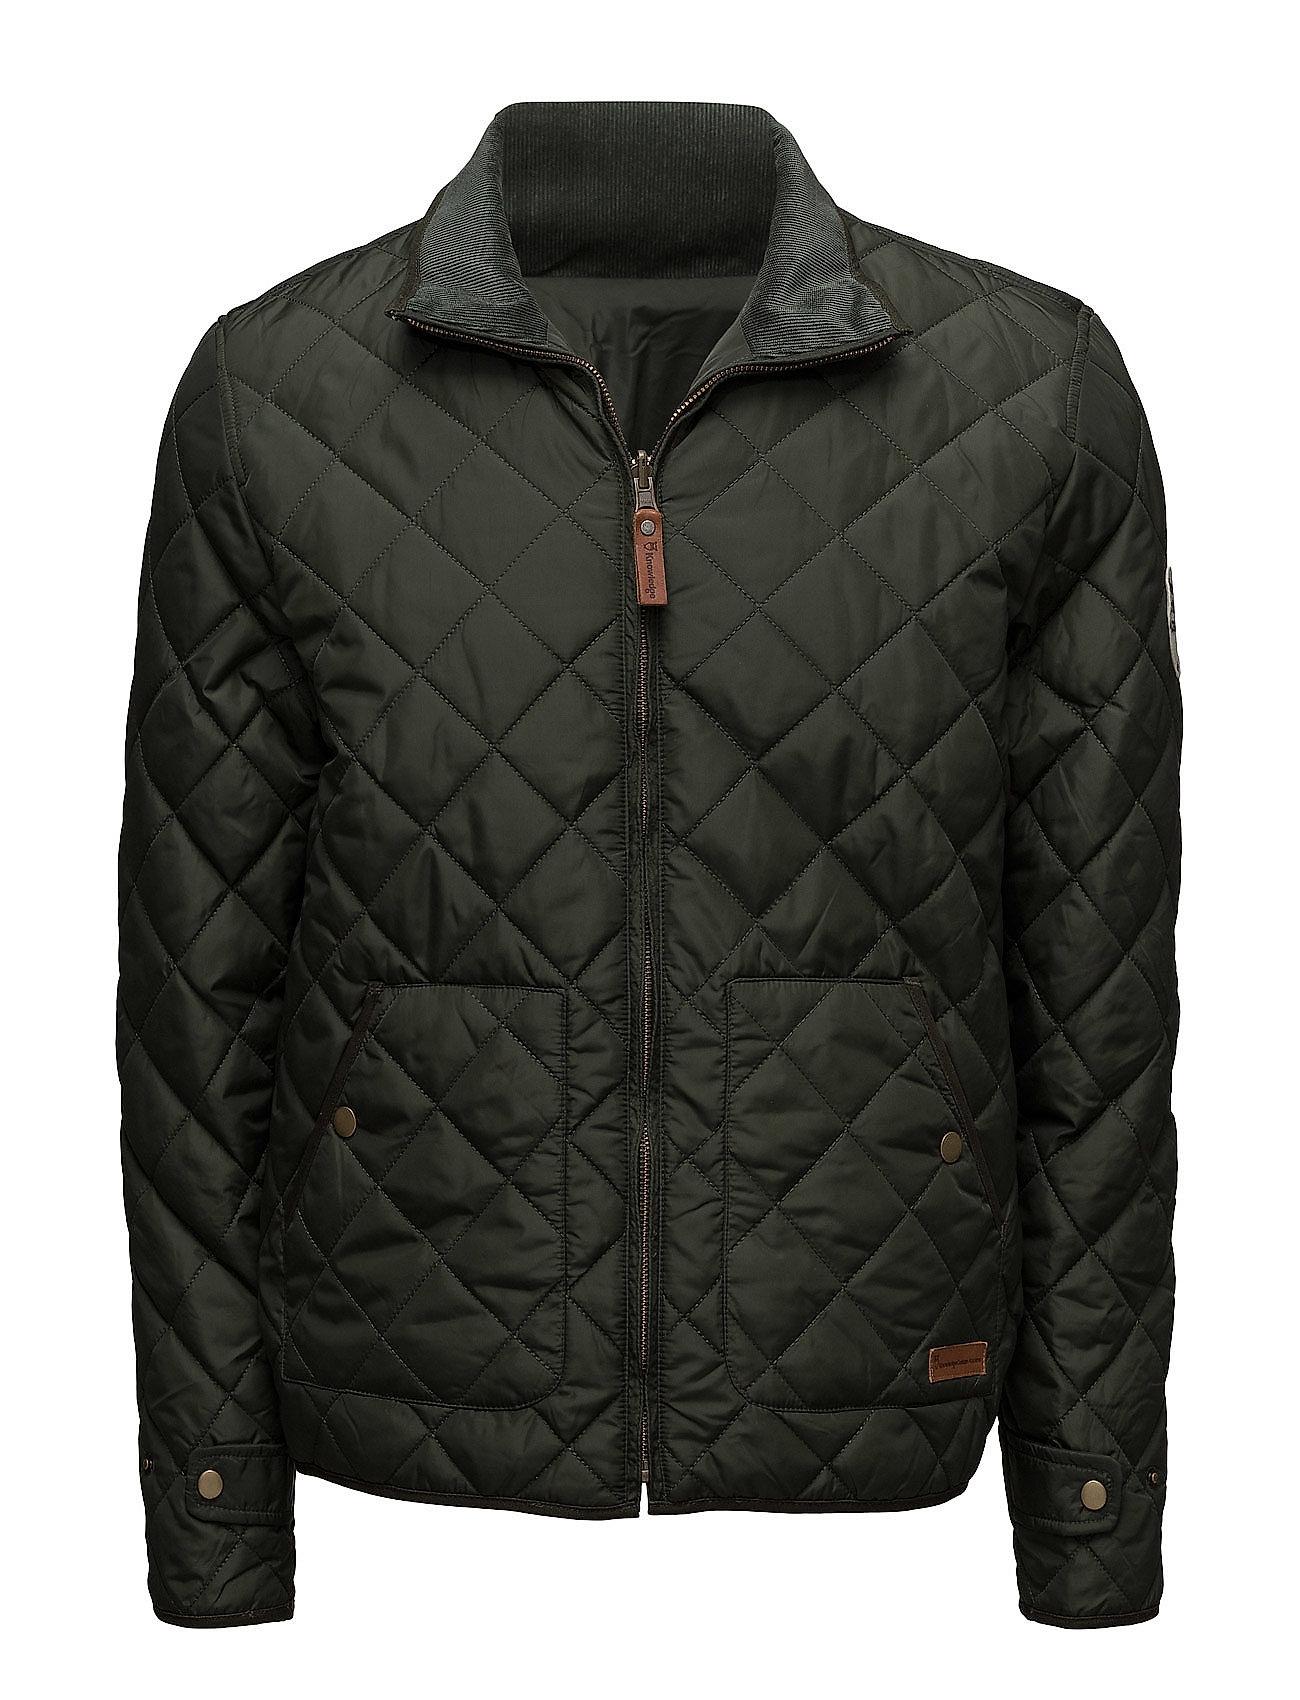 Knowledge Cotton Apparel PET Light Jacket Reversible - GRS/V - FORREST NIGHT